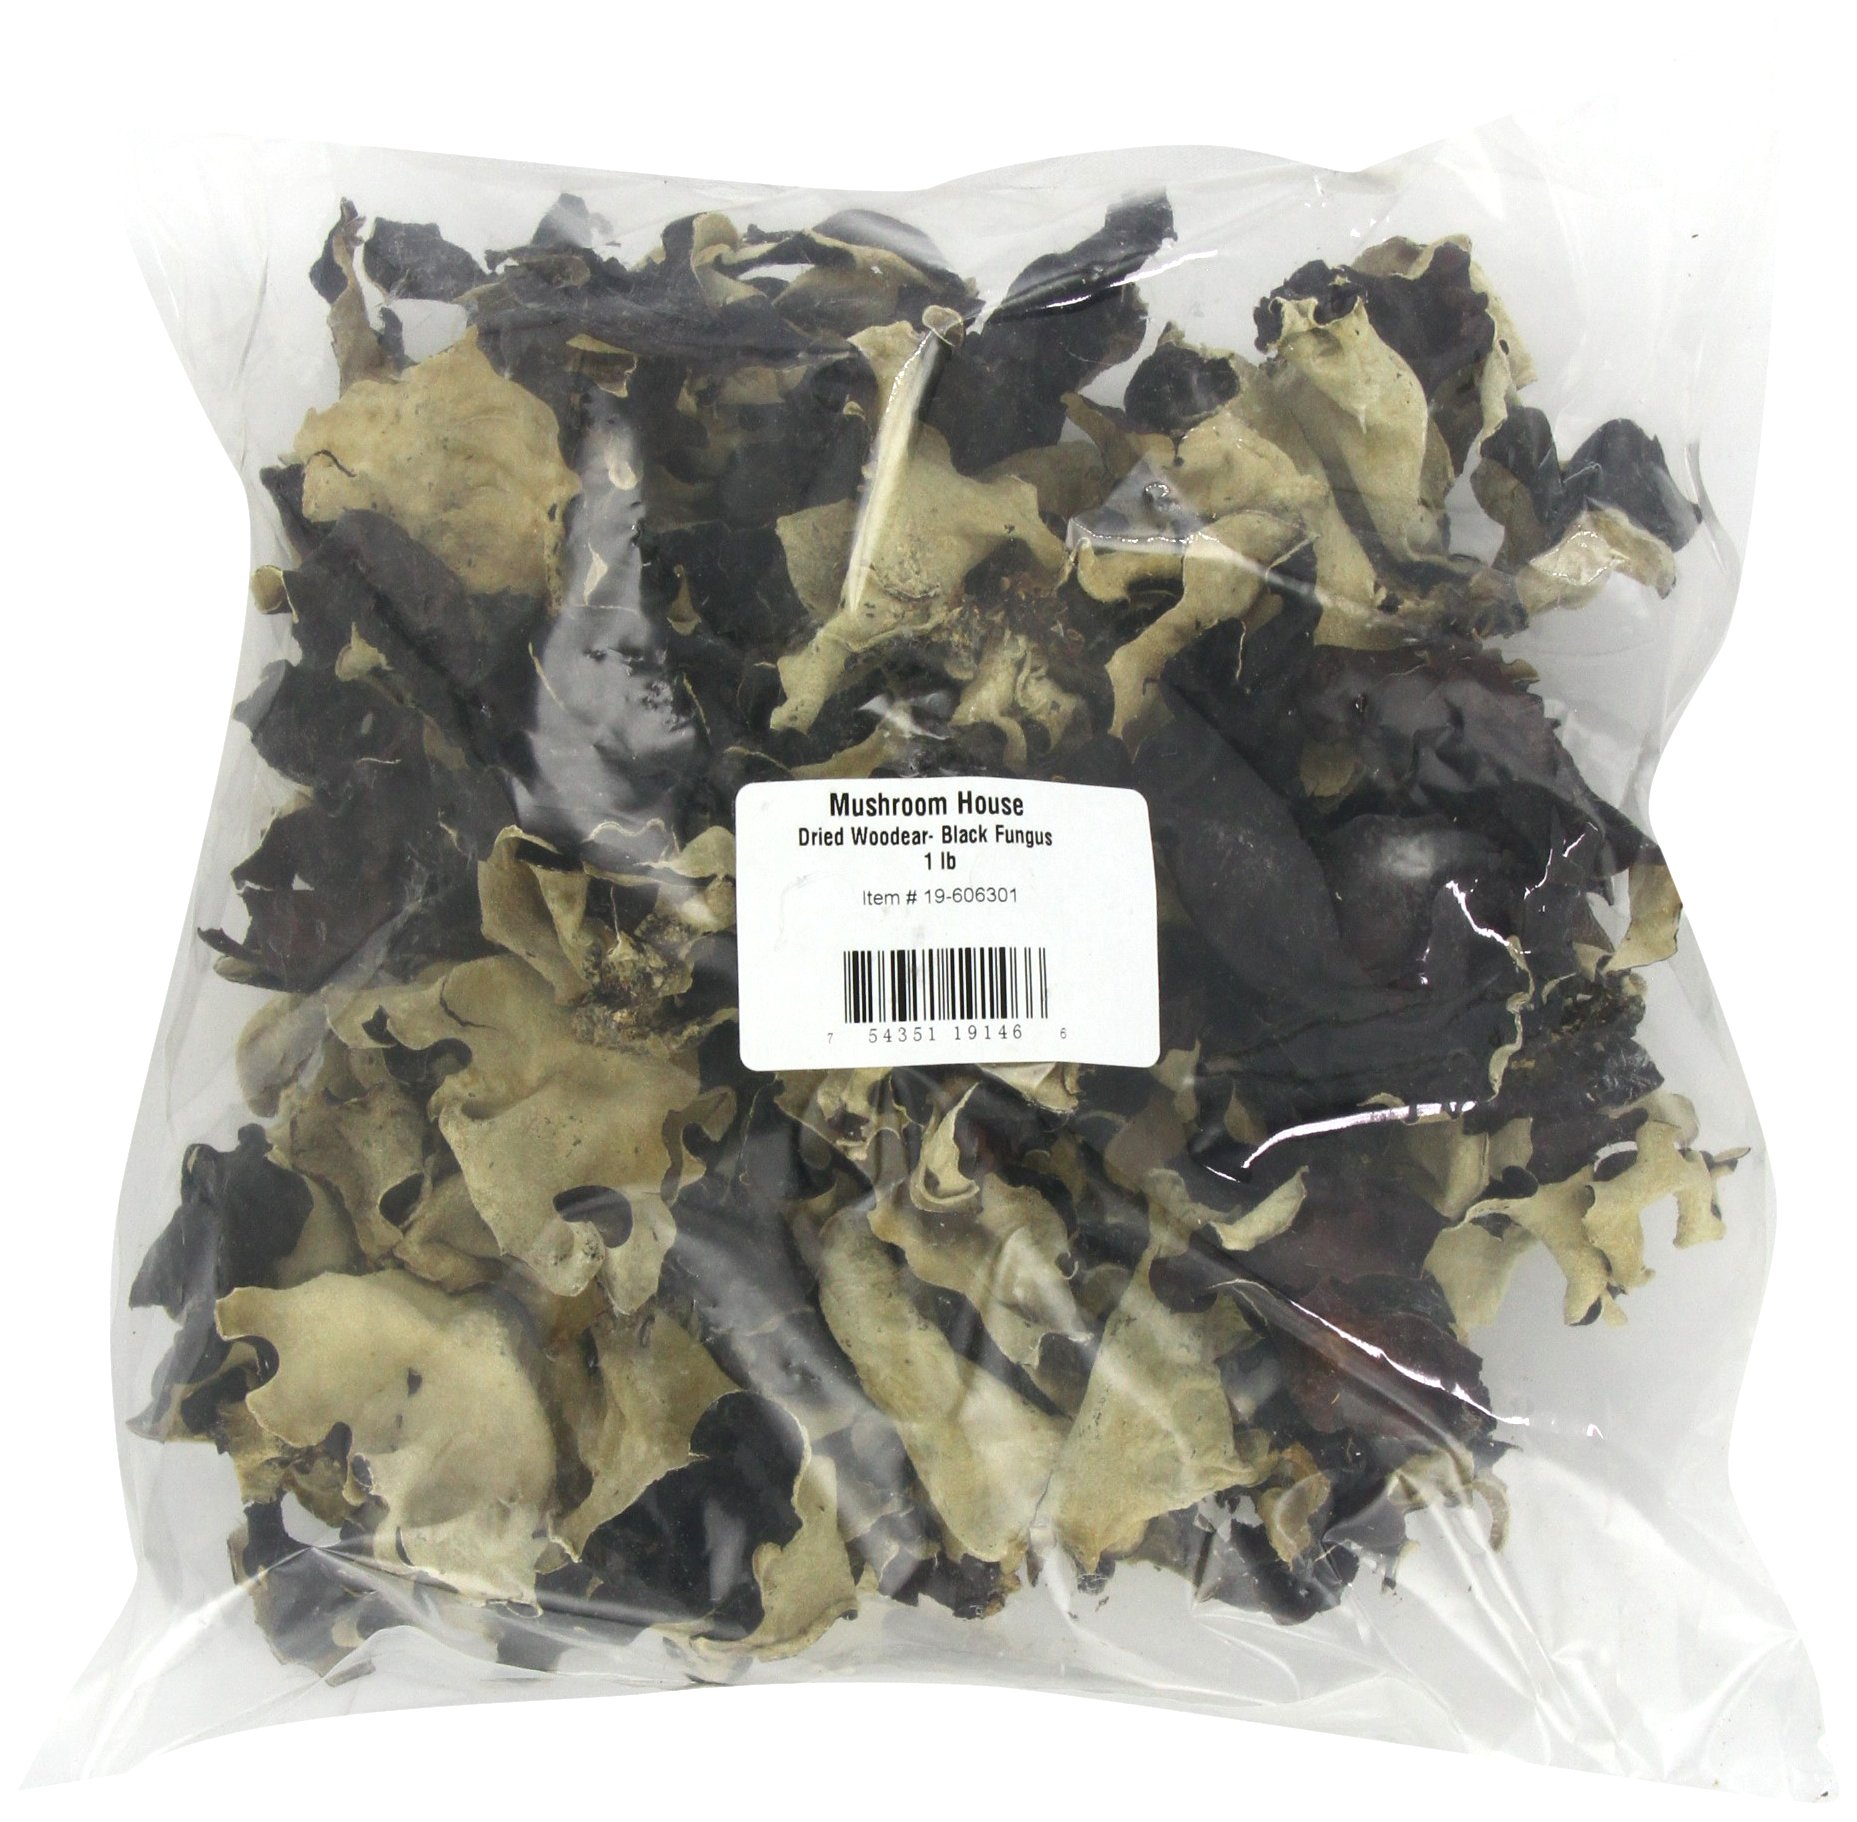 Mushroom House Dried Woodear Mushroom, Black Fungus, 1 Pound